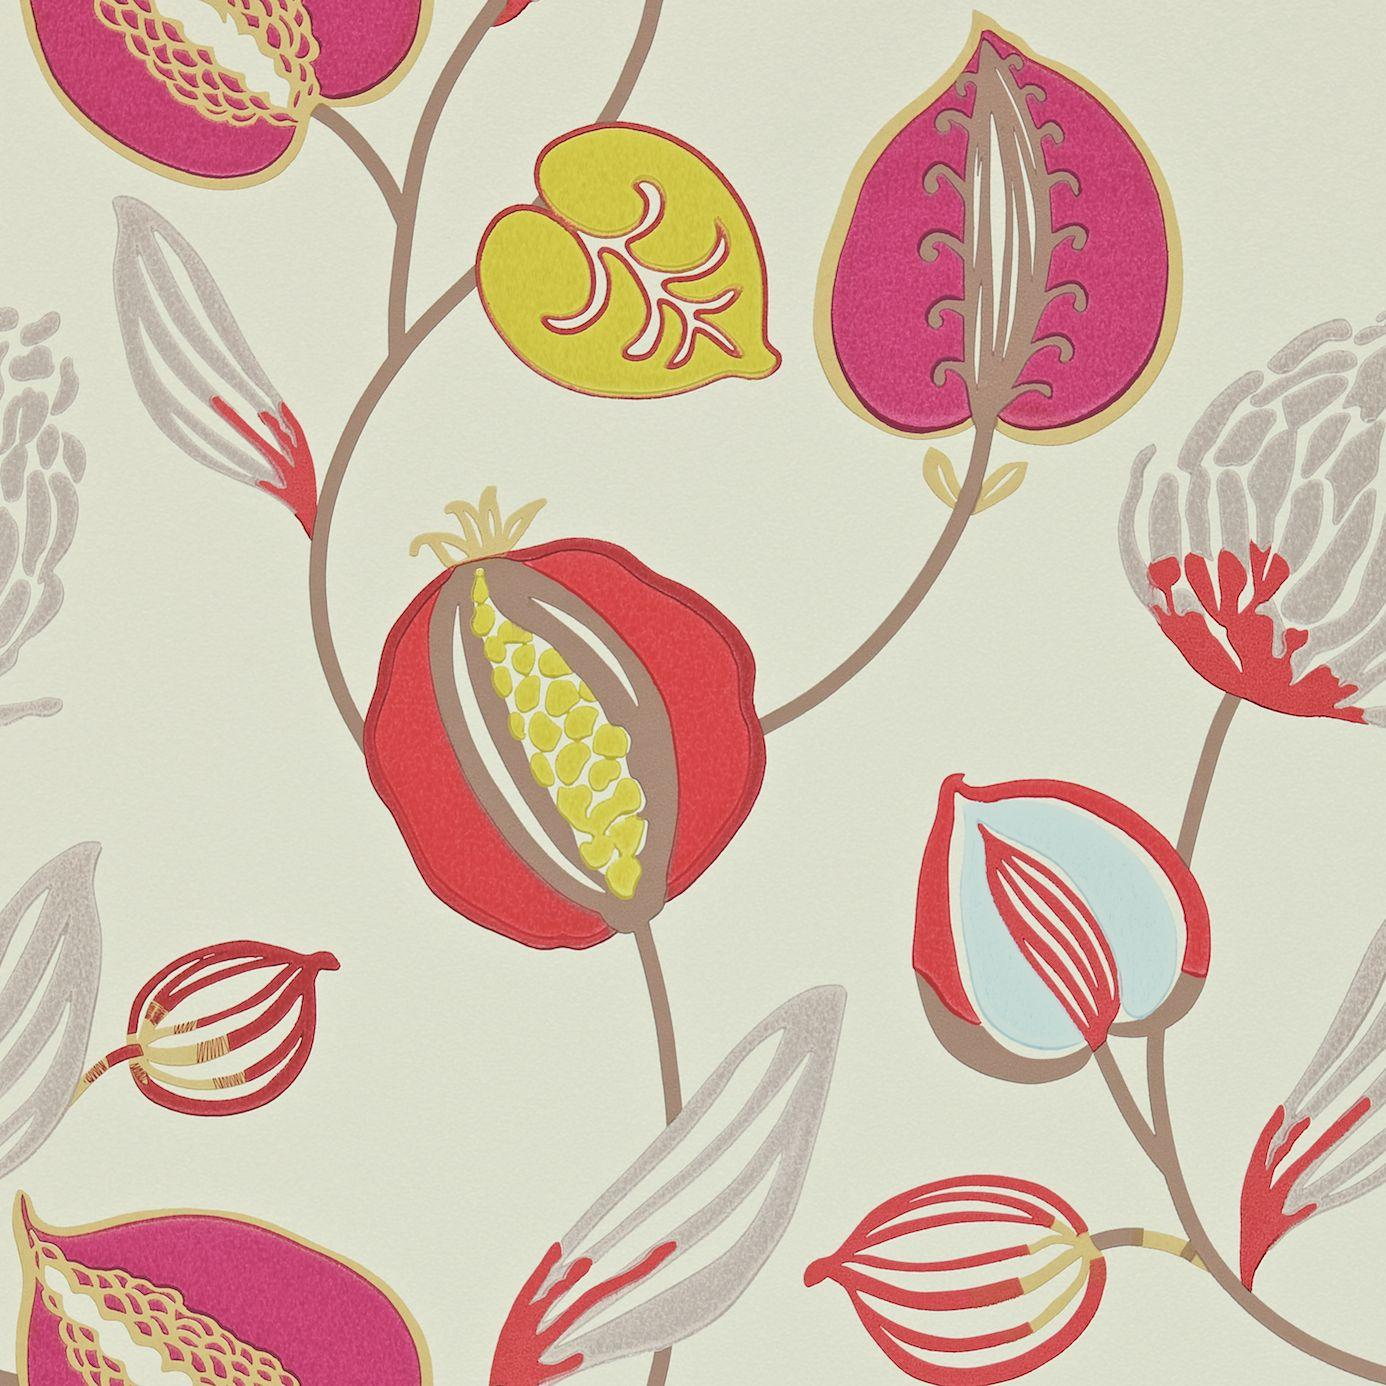 Home Wallpapers Harlequin Folia Wallpapers Tembok Wallpaper - Mist ...